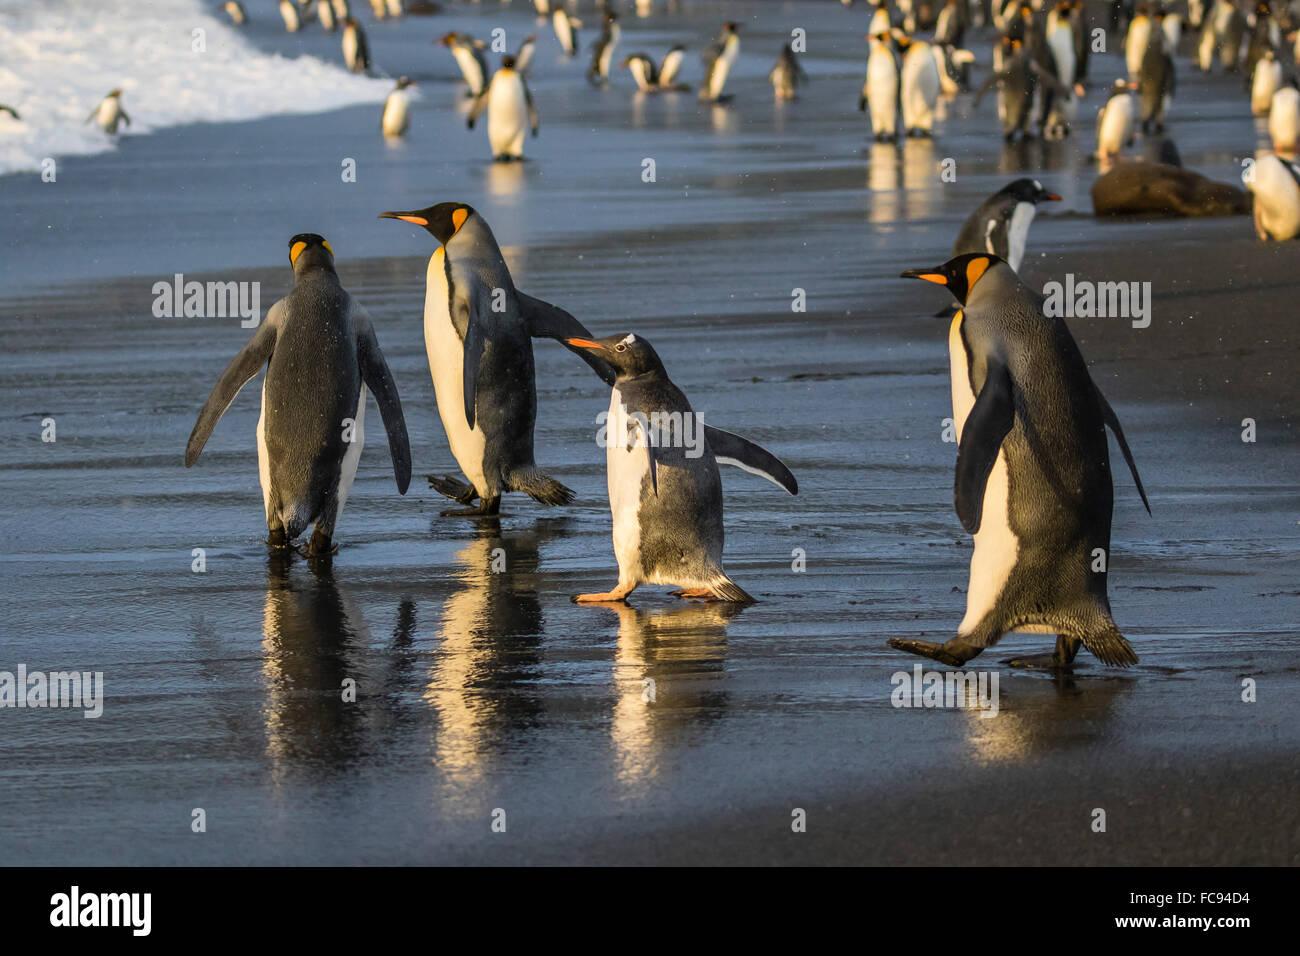 Gentoo penguin (Pygoscelis papua), amongst king penguins on the beach at Gold Harbour, South Georgia, Polar Regions - Stock Image